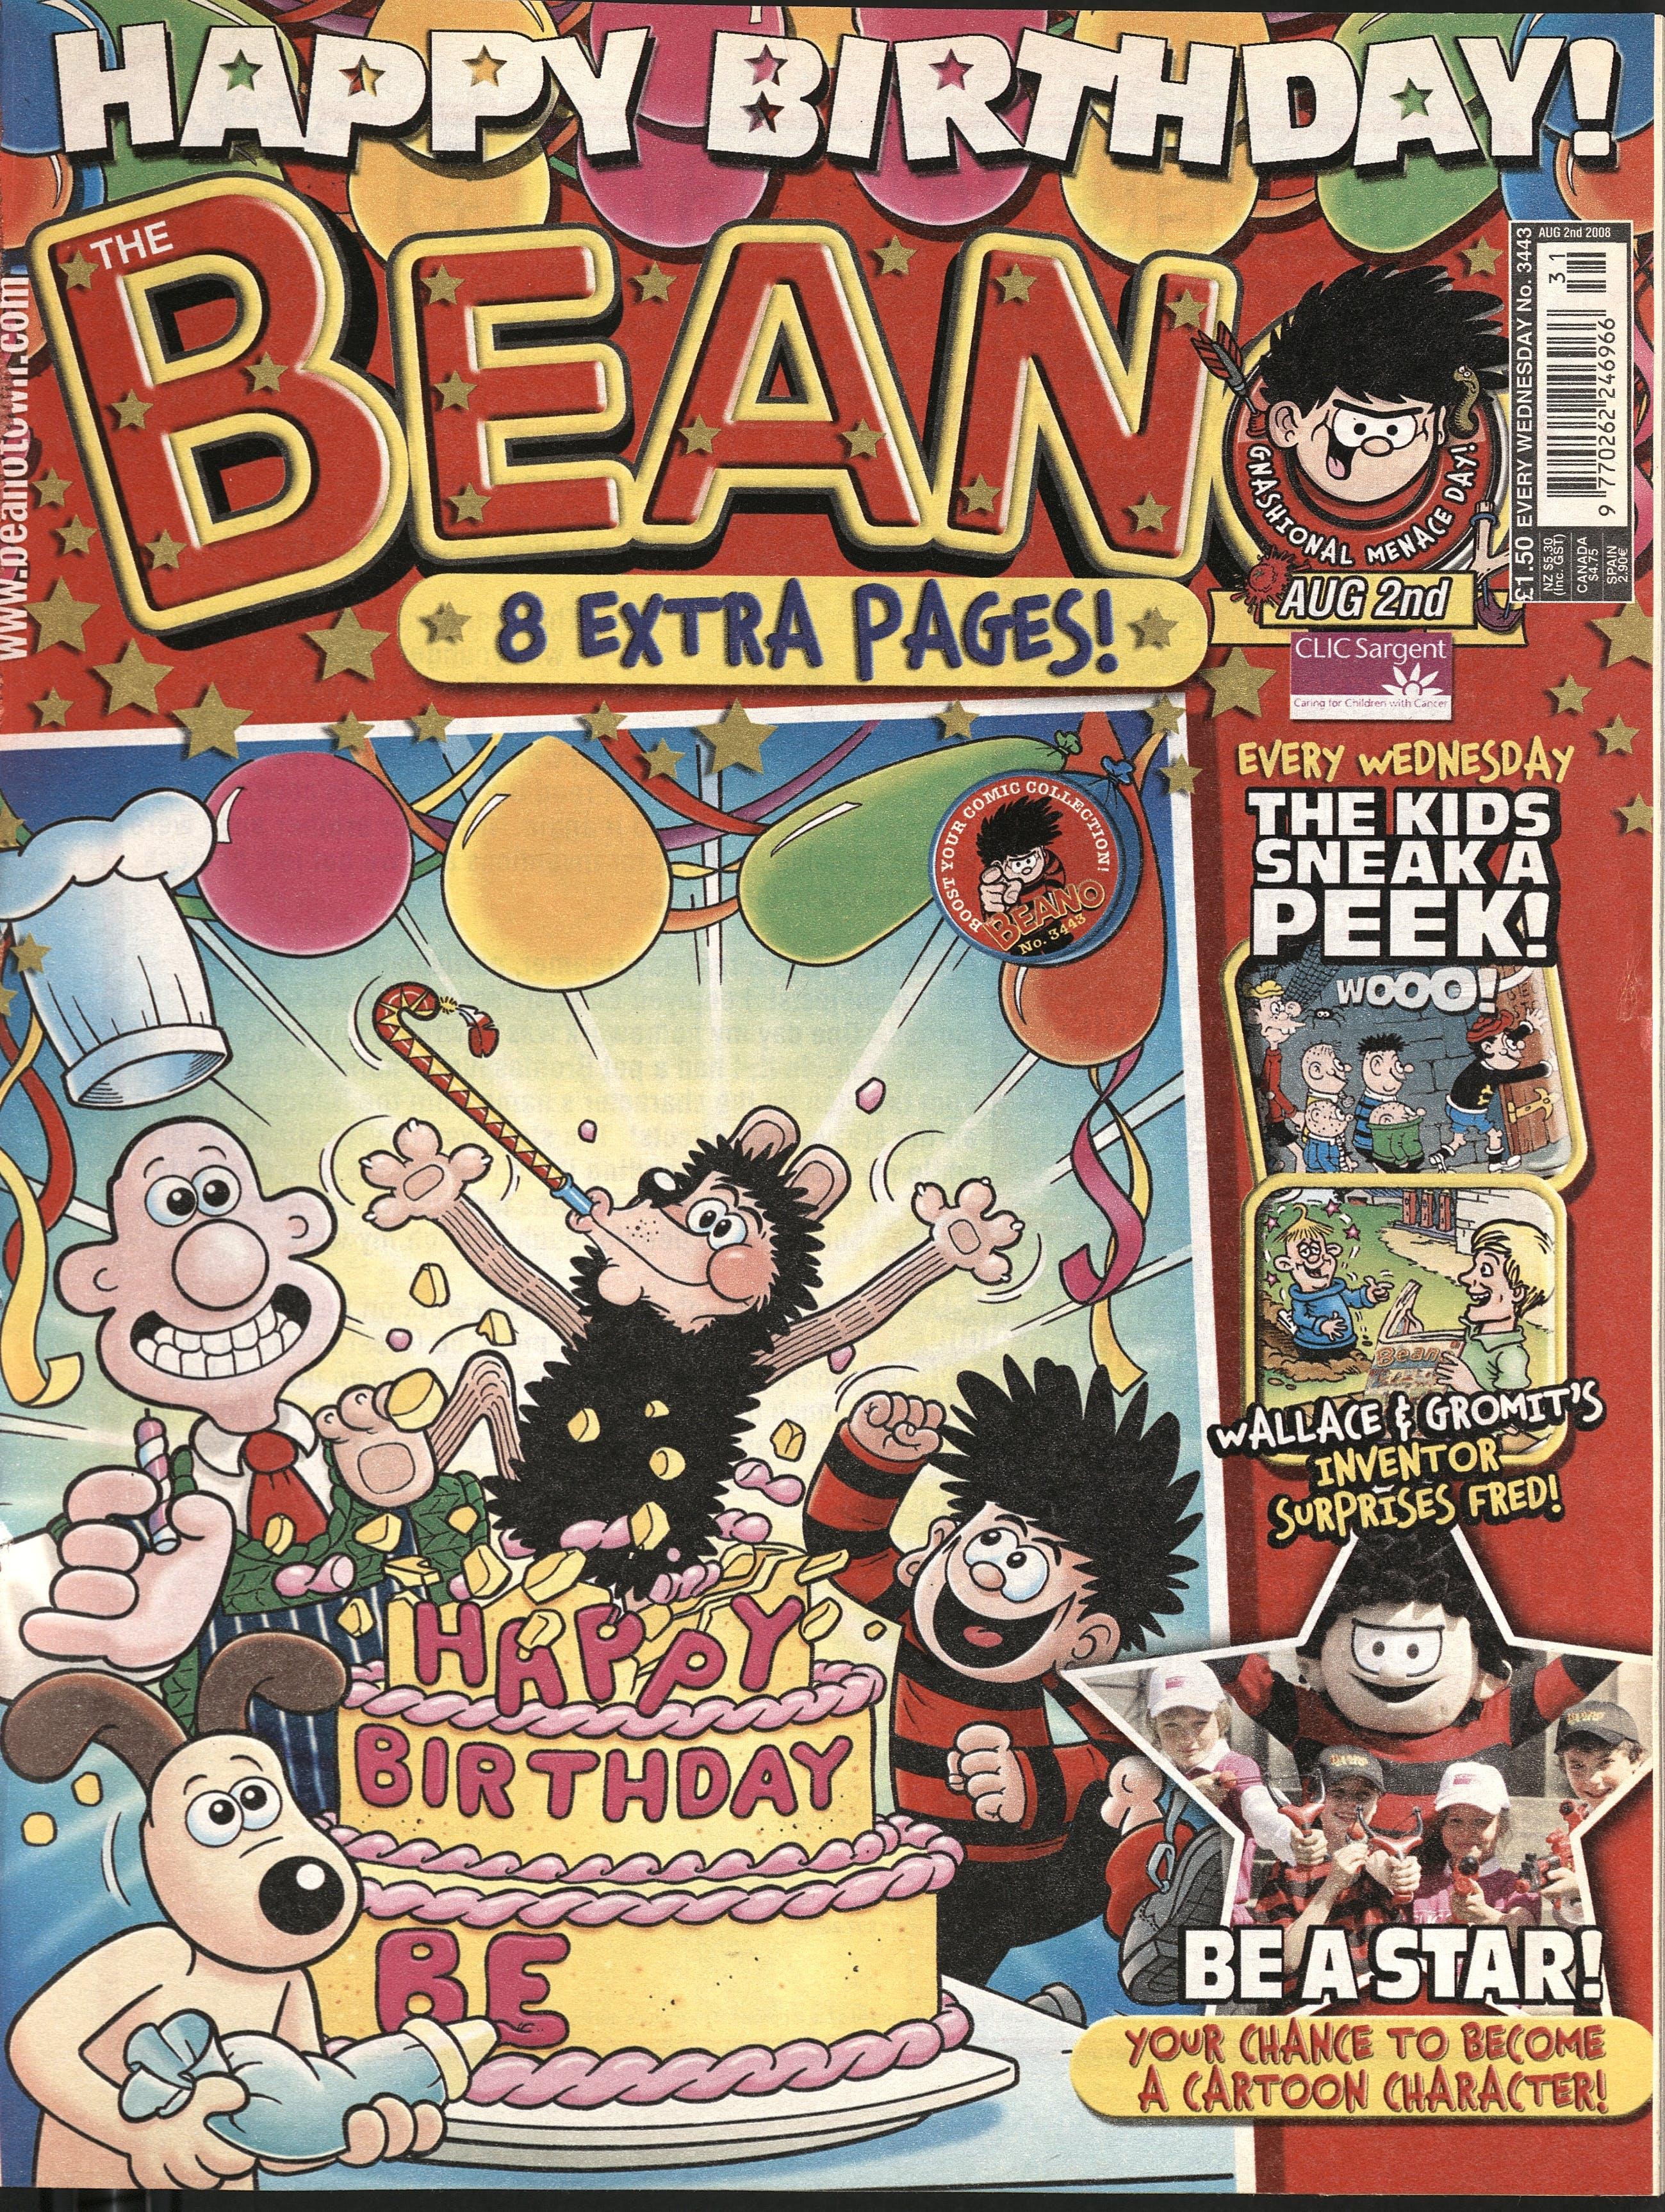 2008 beano cover